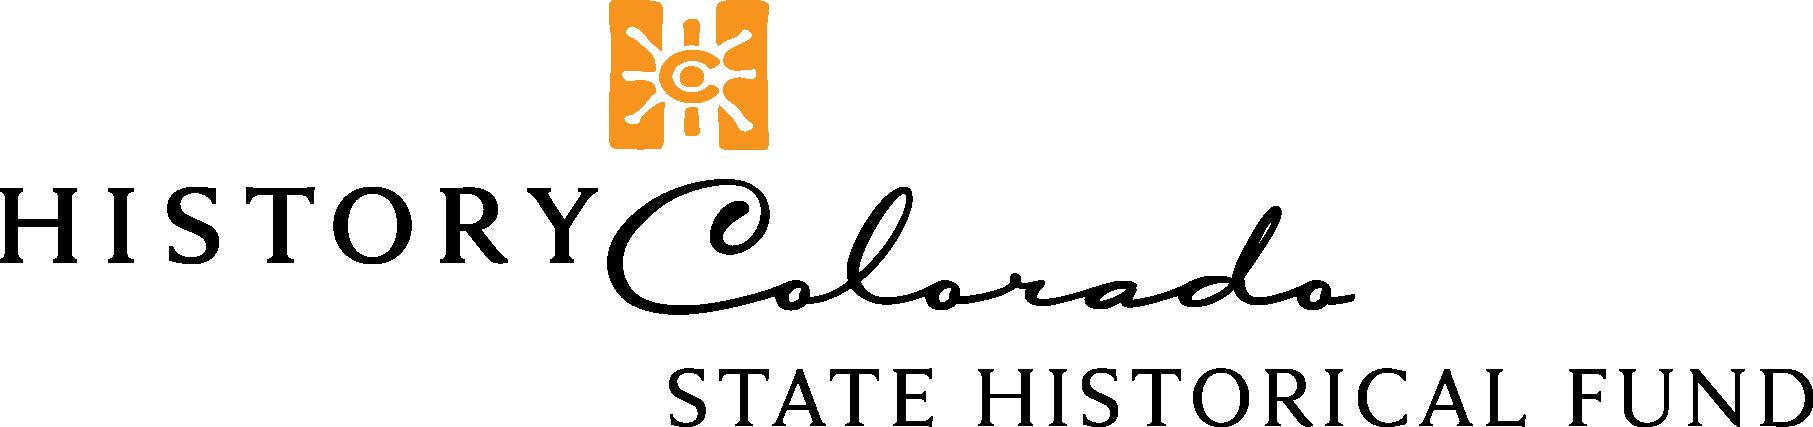 HC_SHF_Logo